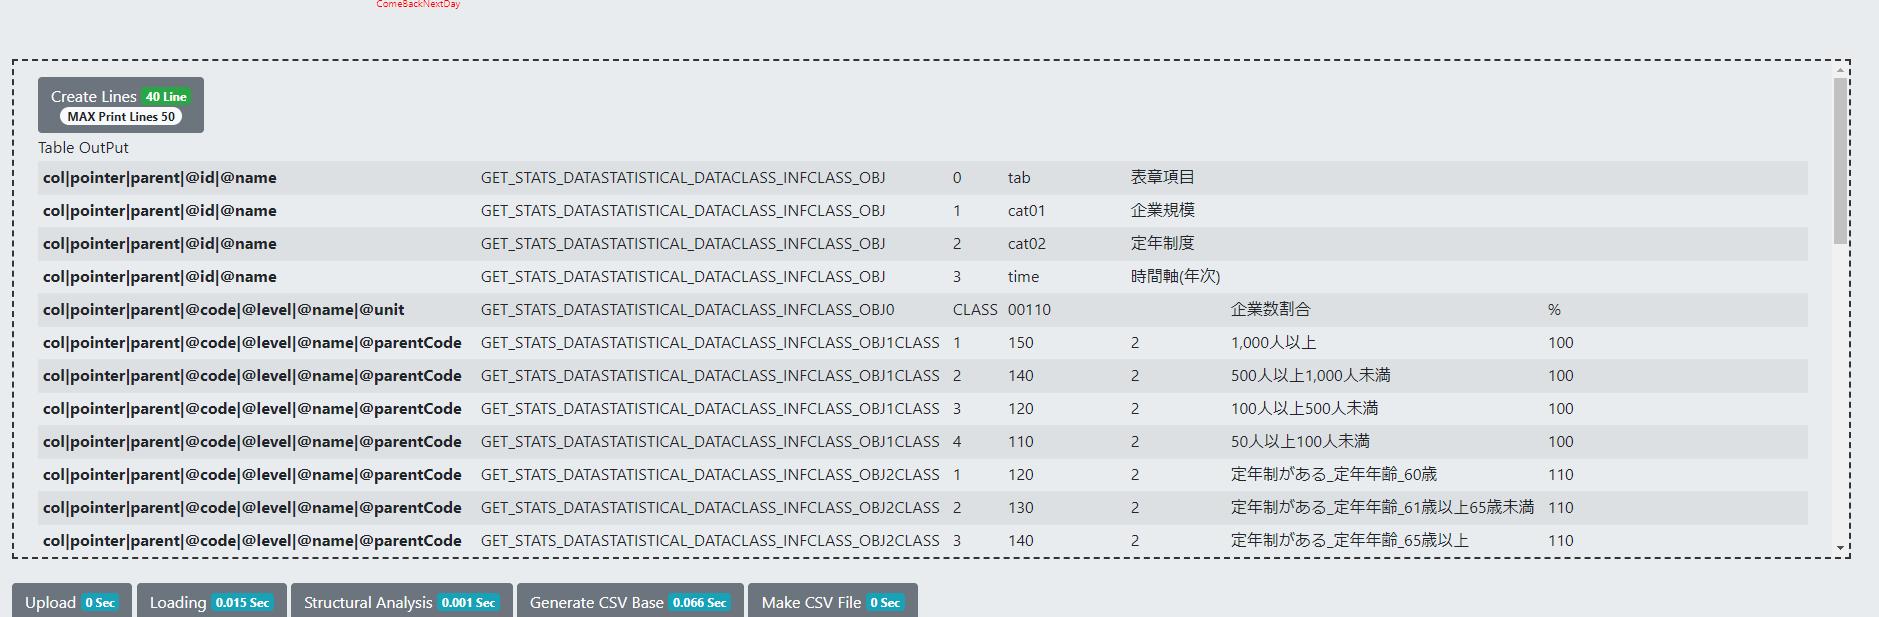 JsonToCSV Jsonファイルを人間が見やすいCSV形式に変換してくれるオンラインコンバーター